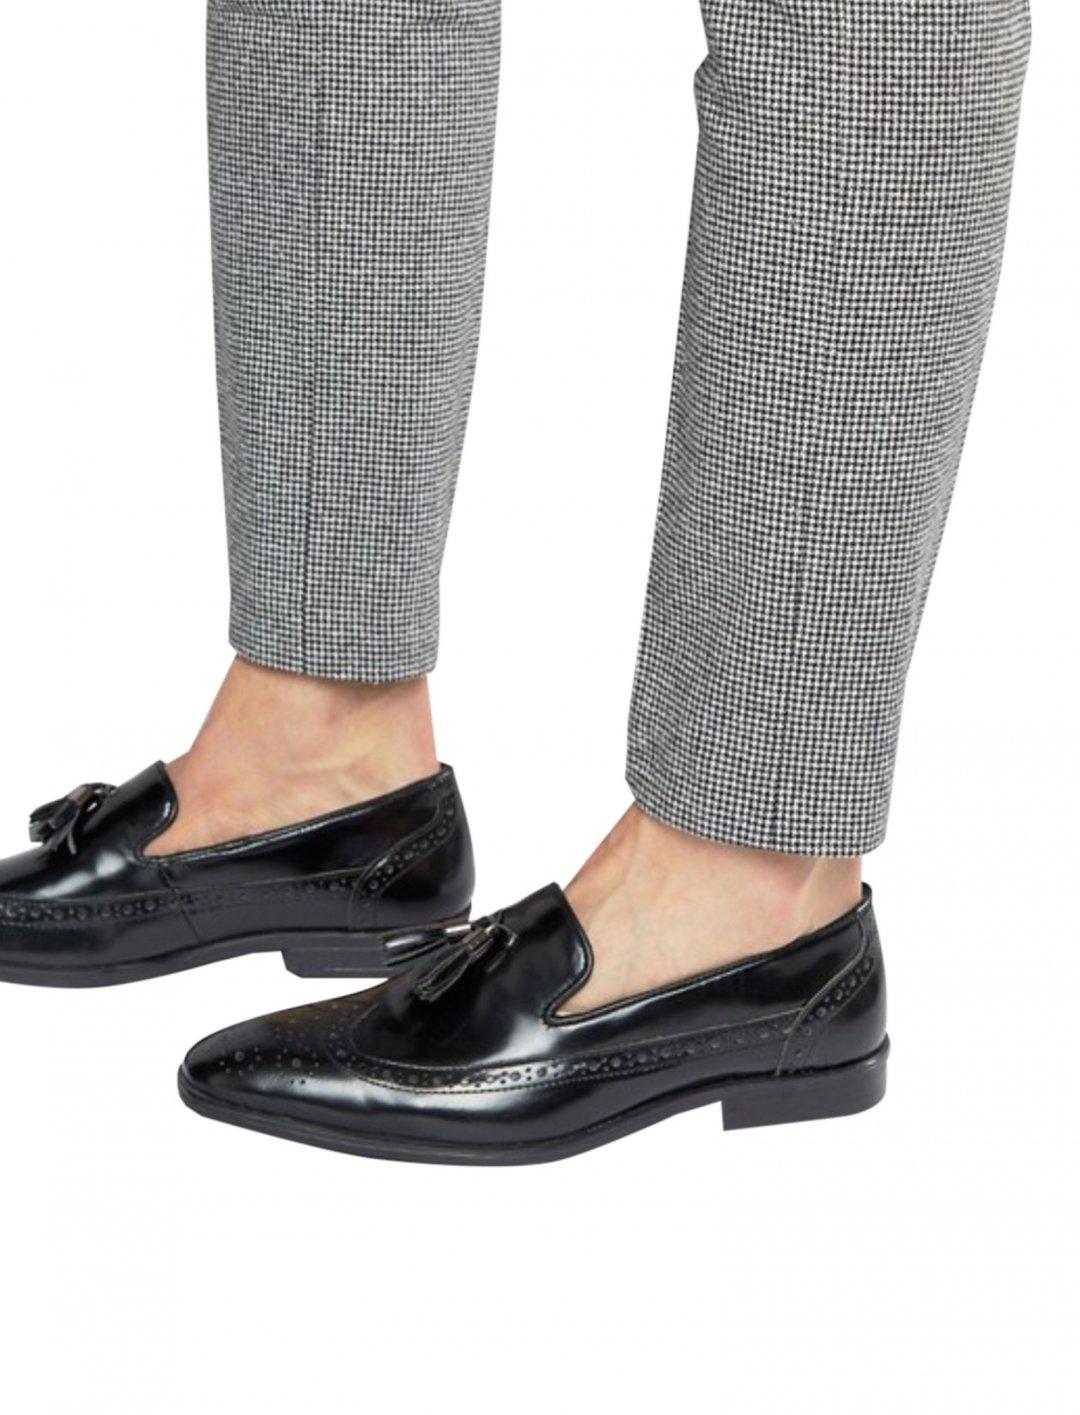 Asos Brogue Loafers Shoes Asos